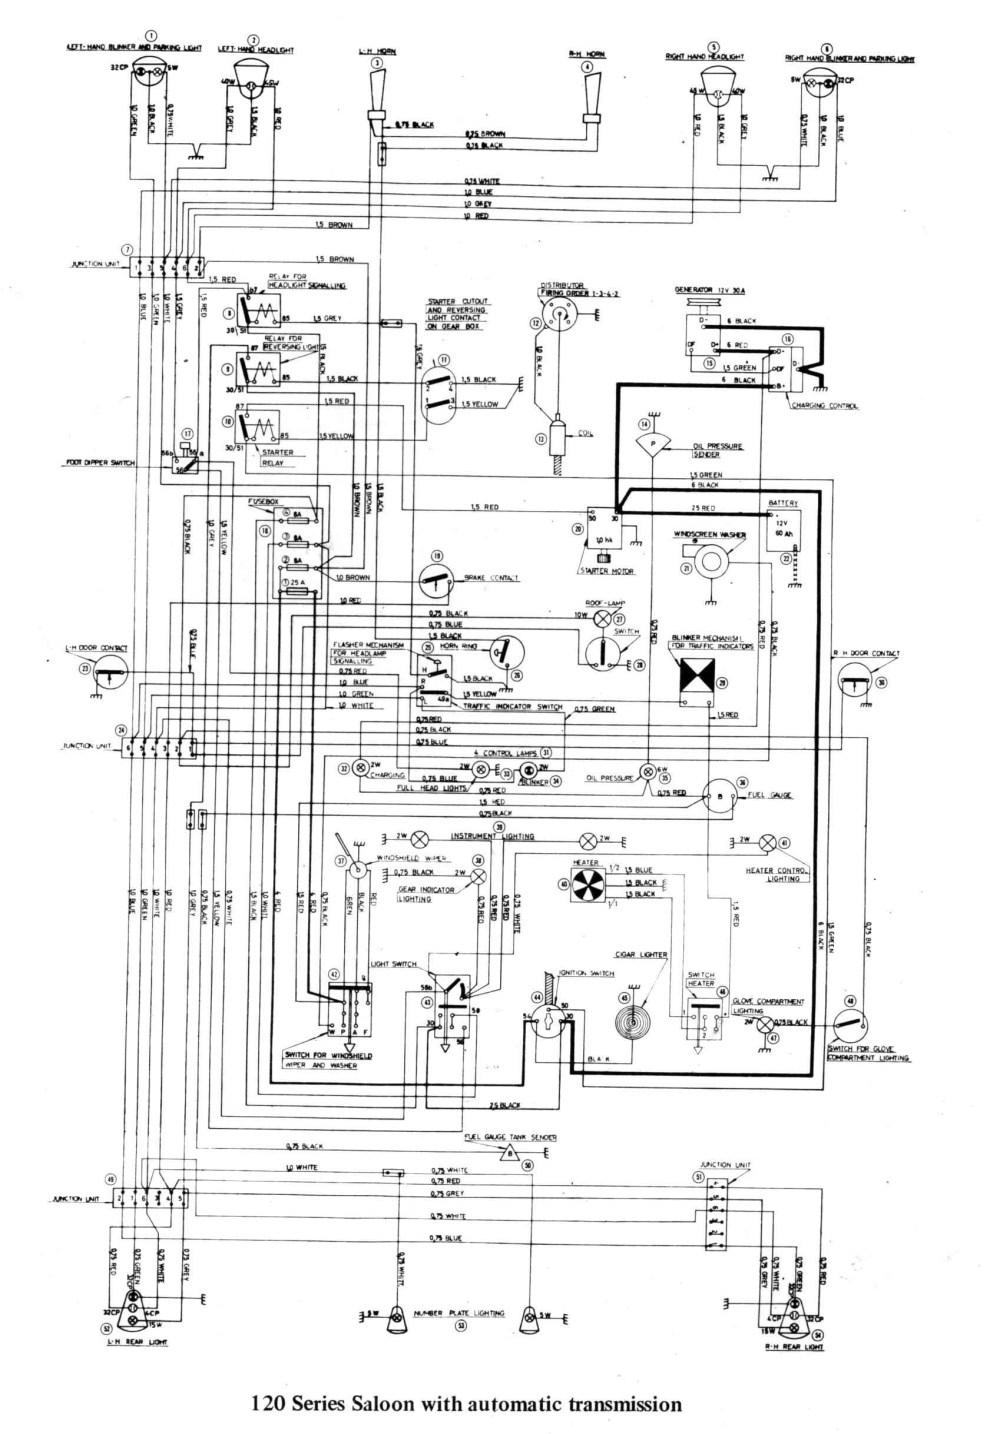 medium resolution of diagrams of turn signal schematic related post turn signal schematic diagram turn signal flasher